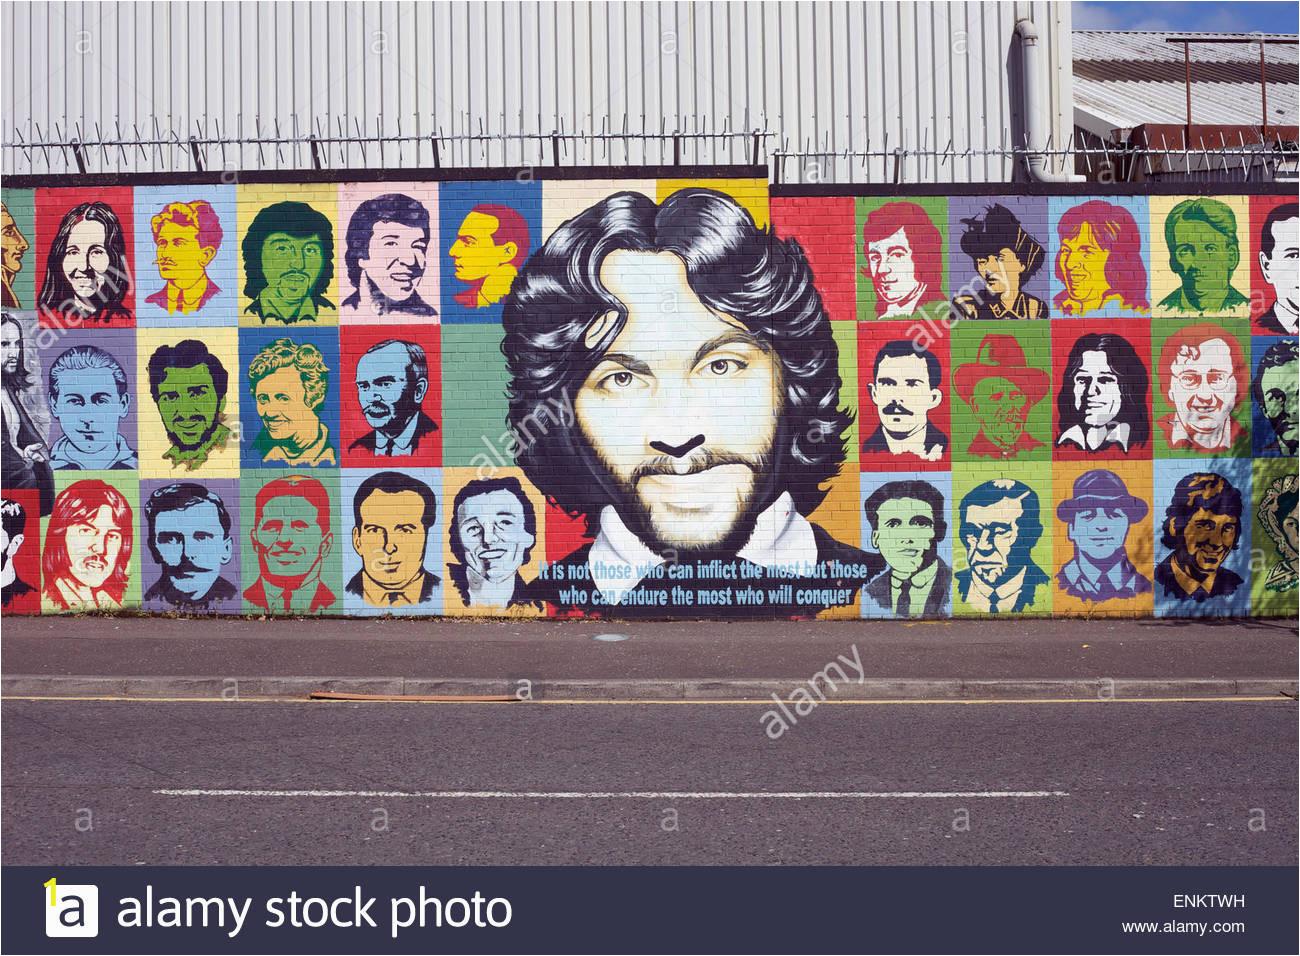 solidaritat wandbild fallt weg belfast nordirland enktwh